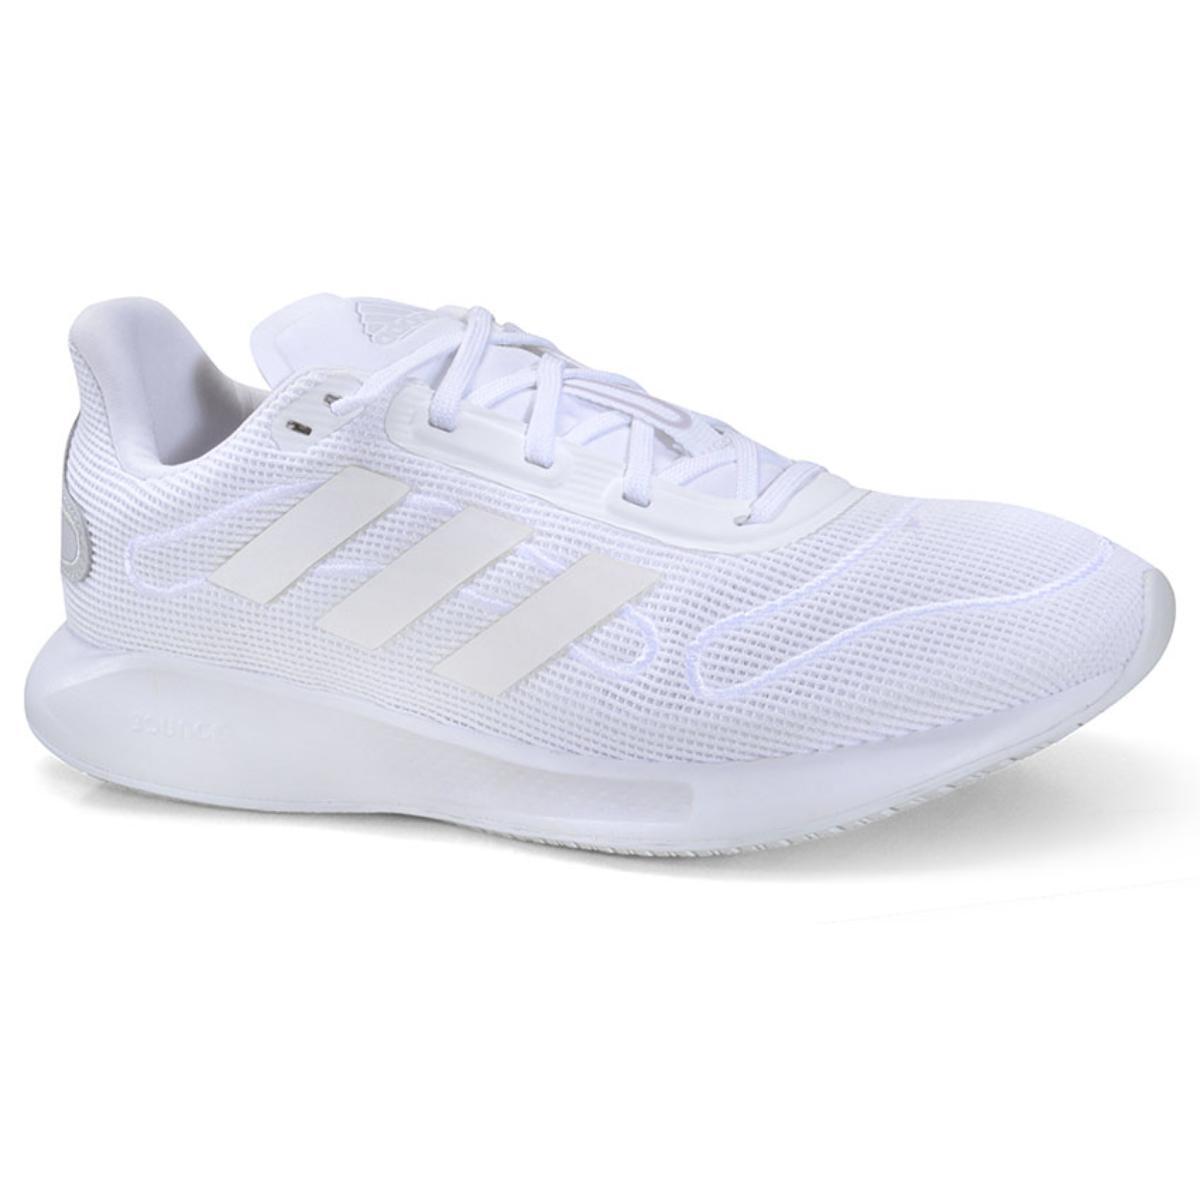 Tênis Feminino Adidas Fv4734 Galaxar Run Branco